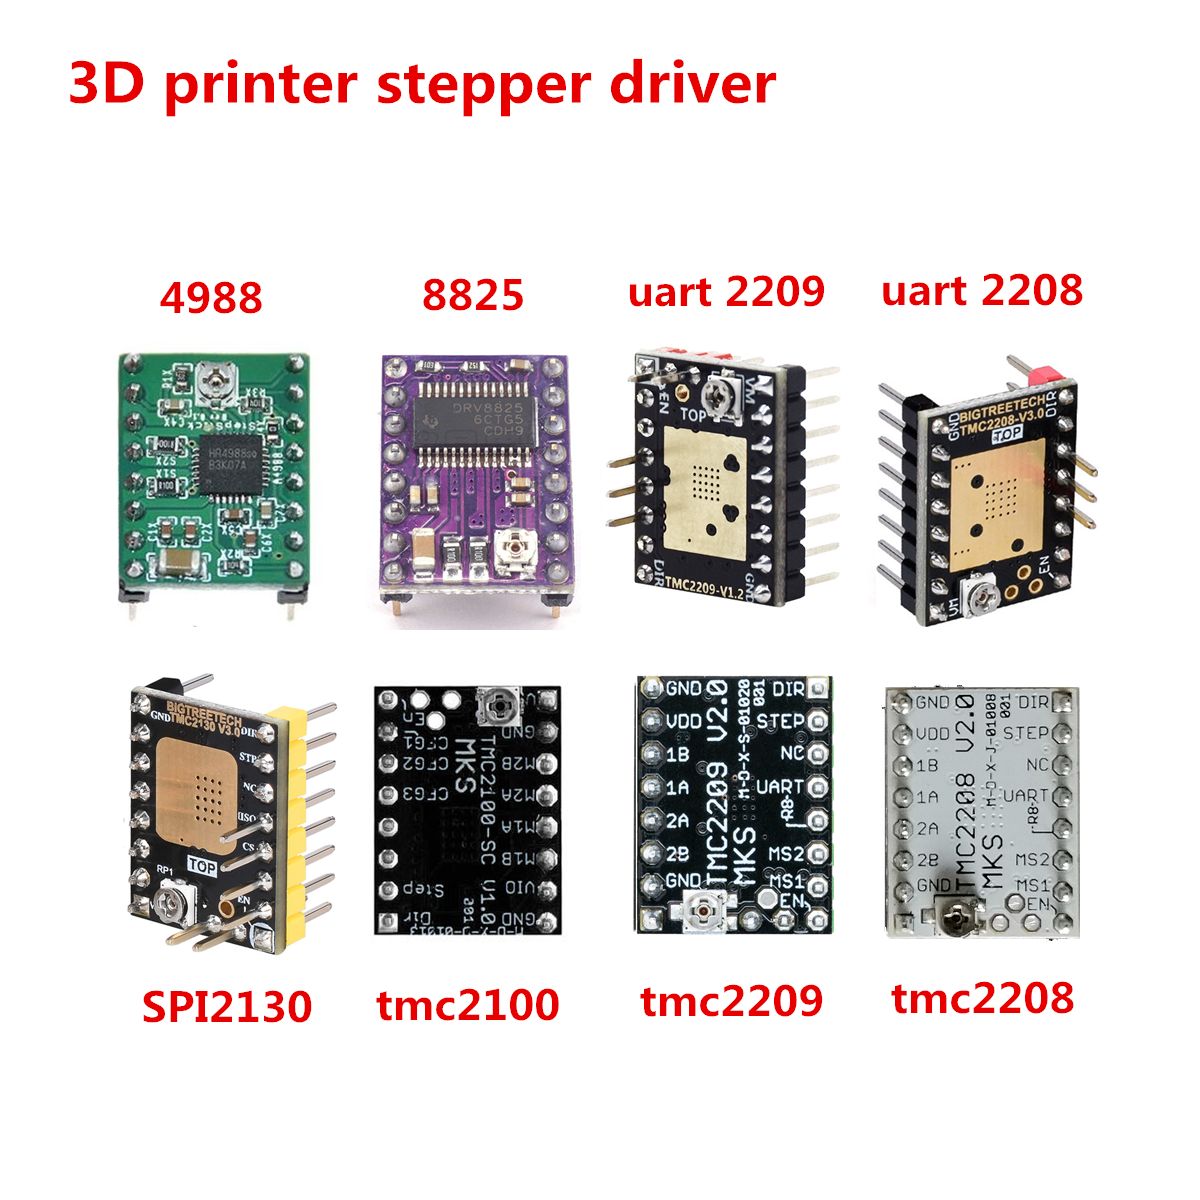 TMC2208 TMC2100 TMC2209 TMC2130 DRV8825 A4988 스테퍼 모터 드라이버 uart TMC 2208 2209 SKR V1.3 MKS SGEN L 용 스테핑 드라이버